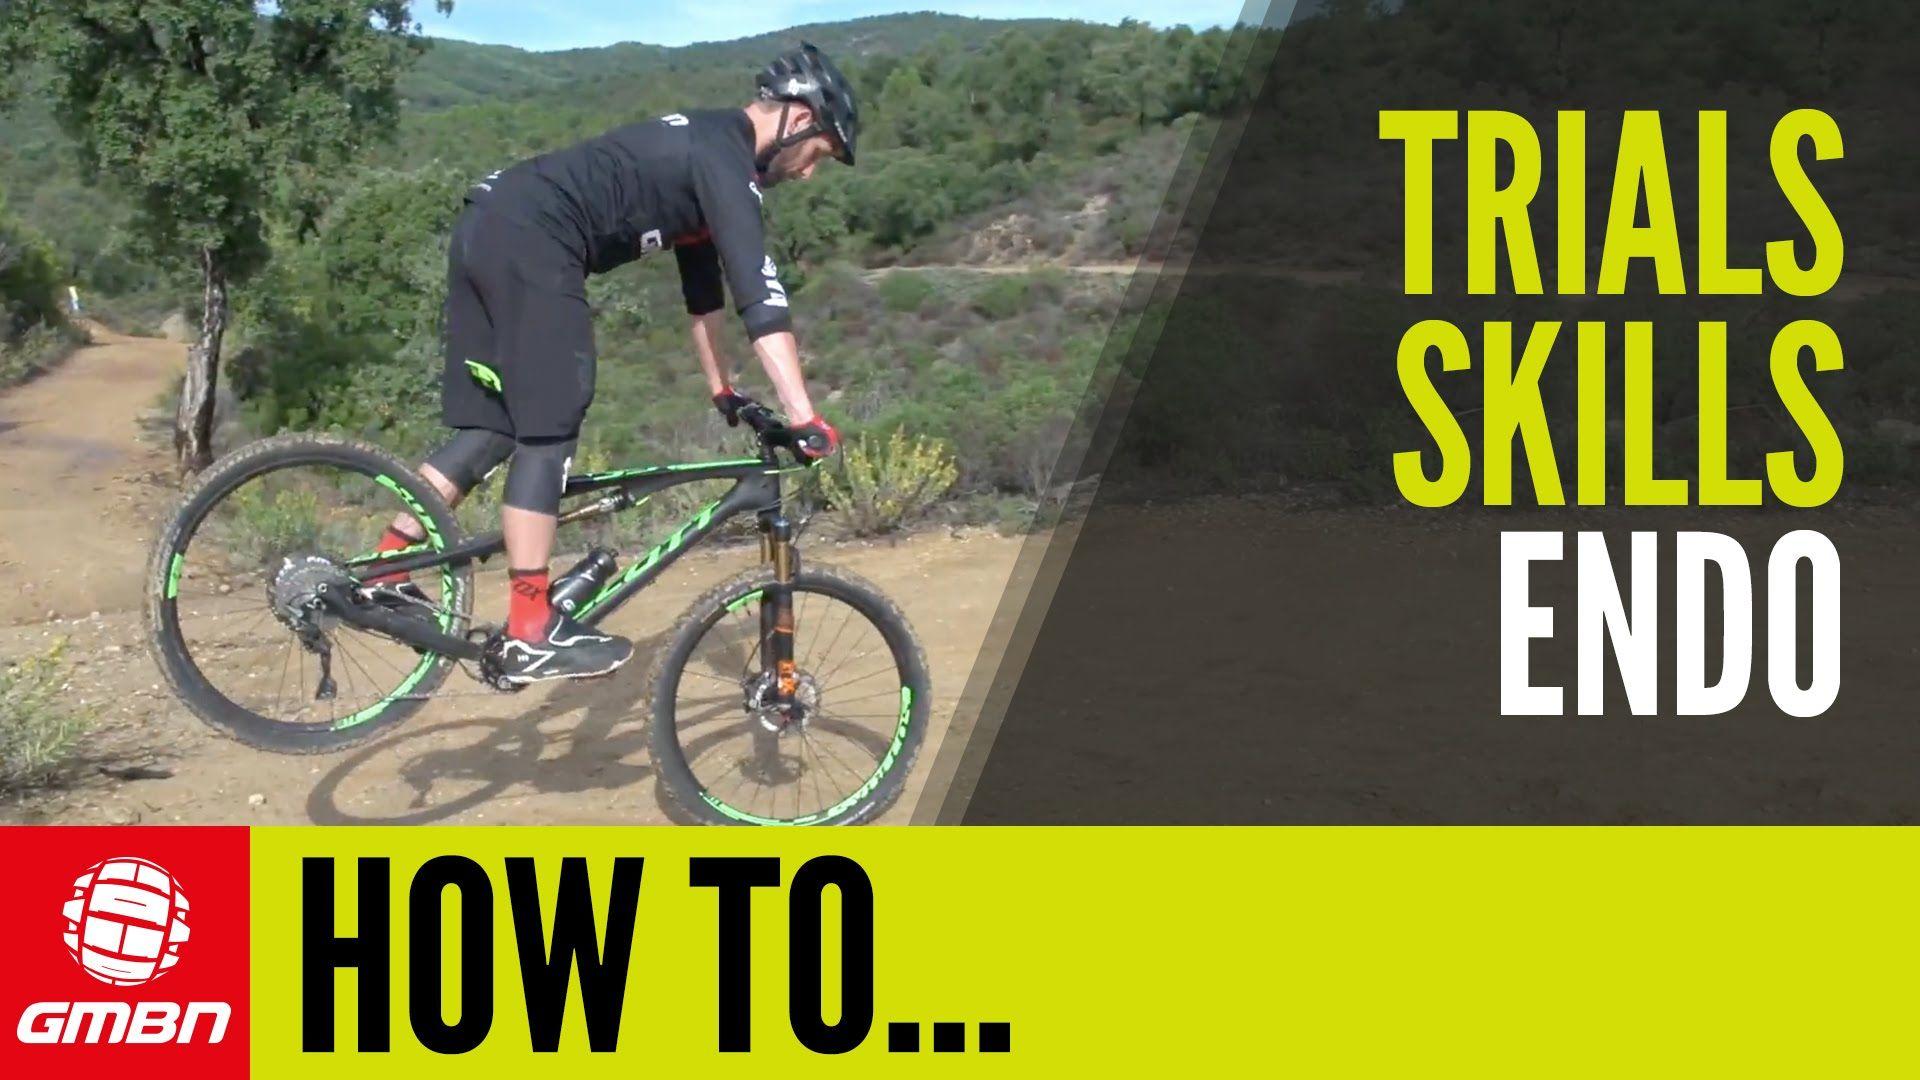 Trials Skills How To Endo Mountain Biking Mountain Biking Uk Bike